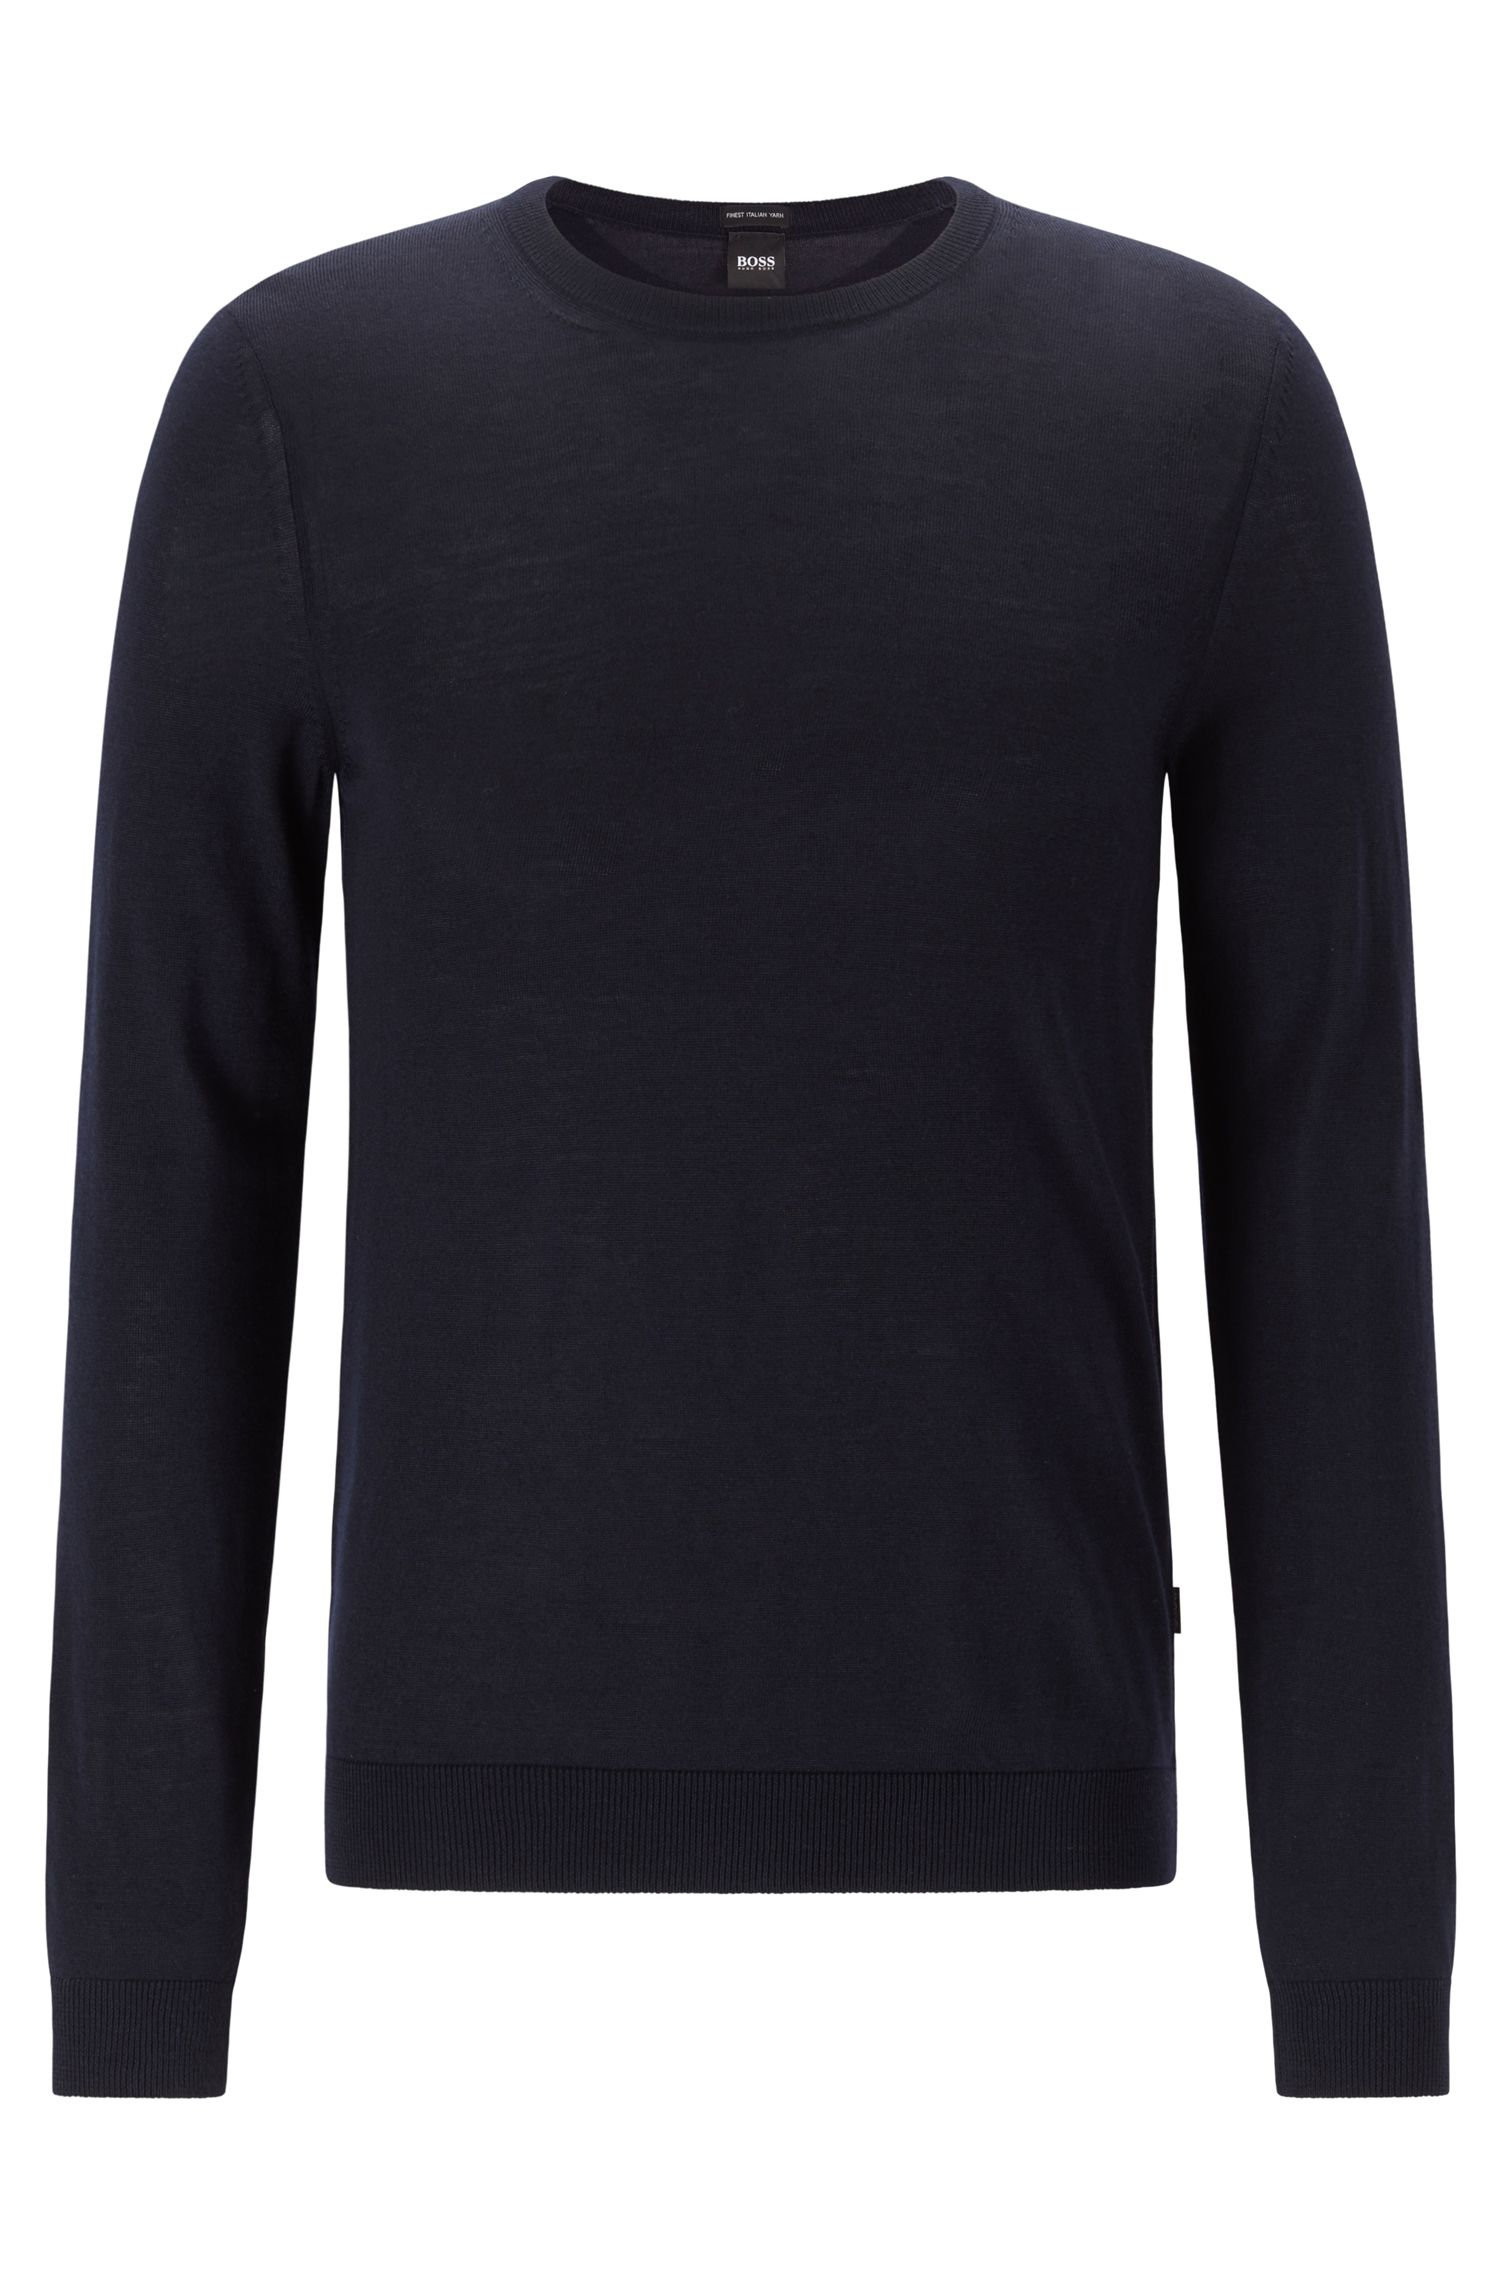 Hugo Boss - Jersey de cuello redondo en lana virgen - 1